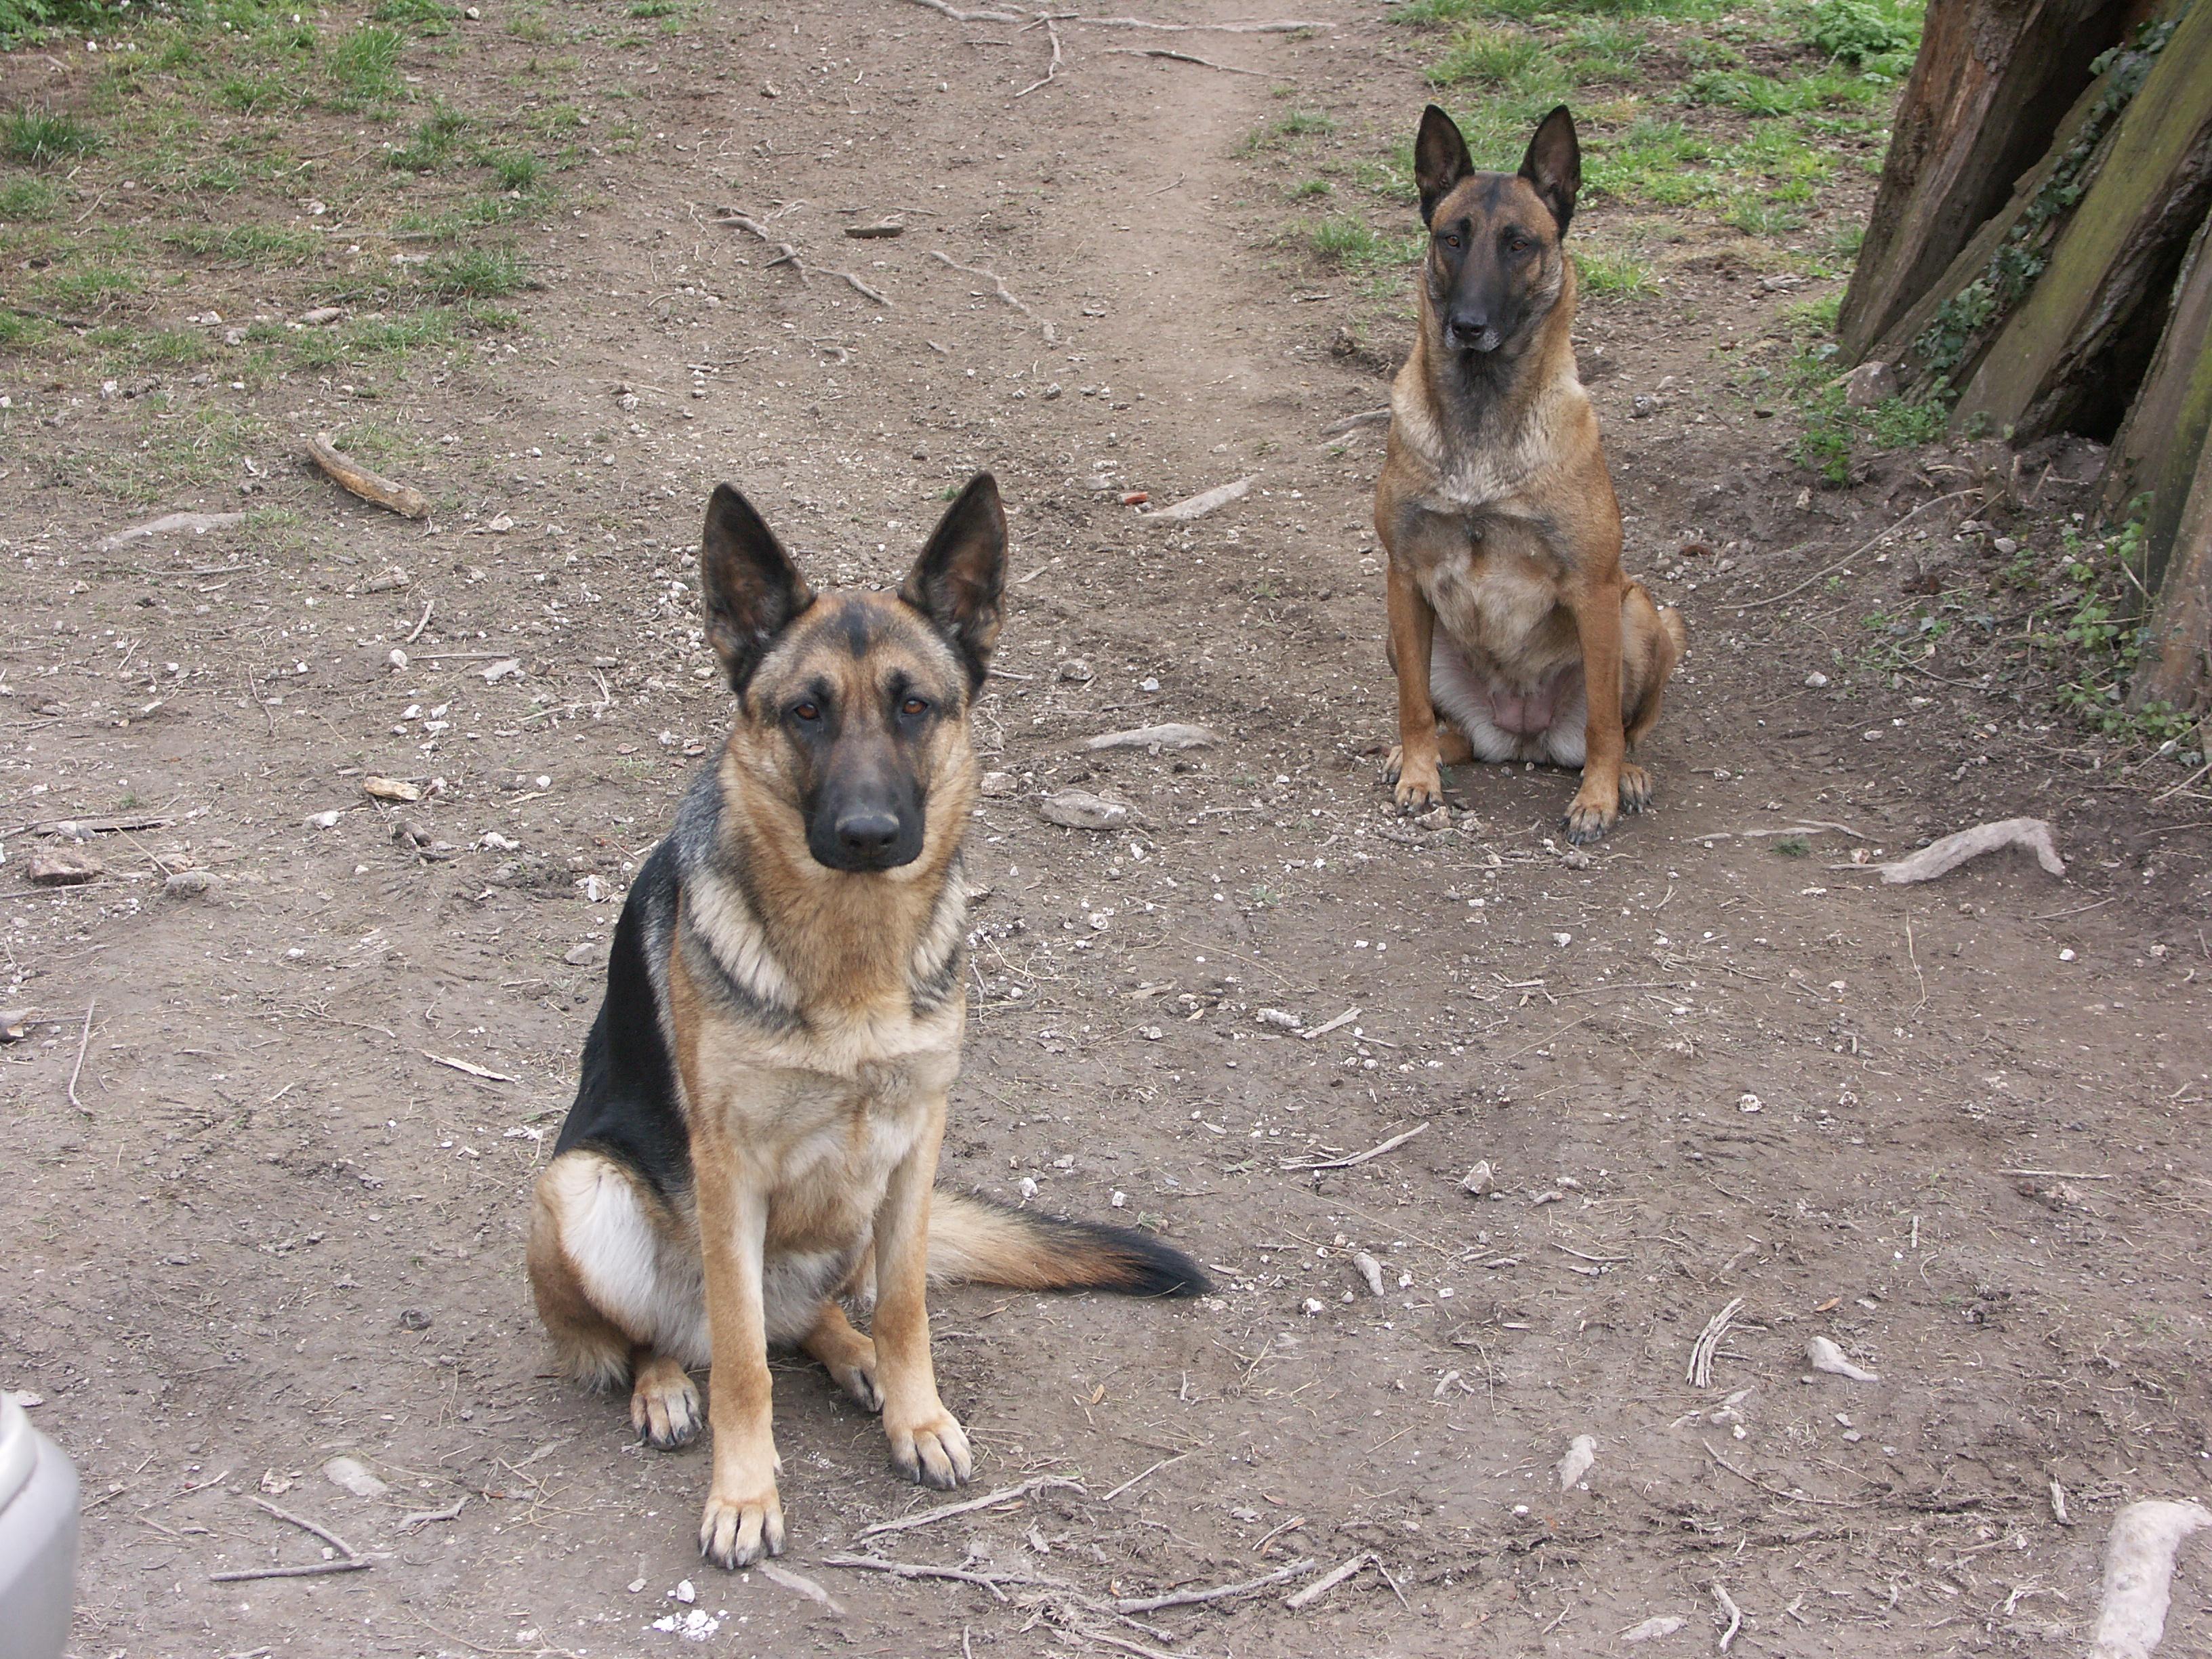 mes deux chiennes vont mourir... - Page 4 31567820050218001ScaryUlna